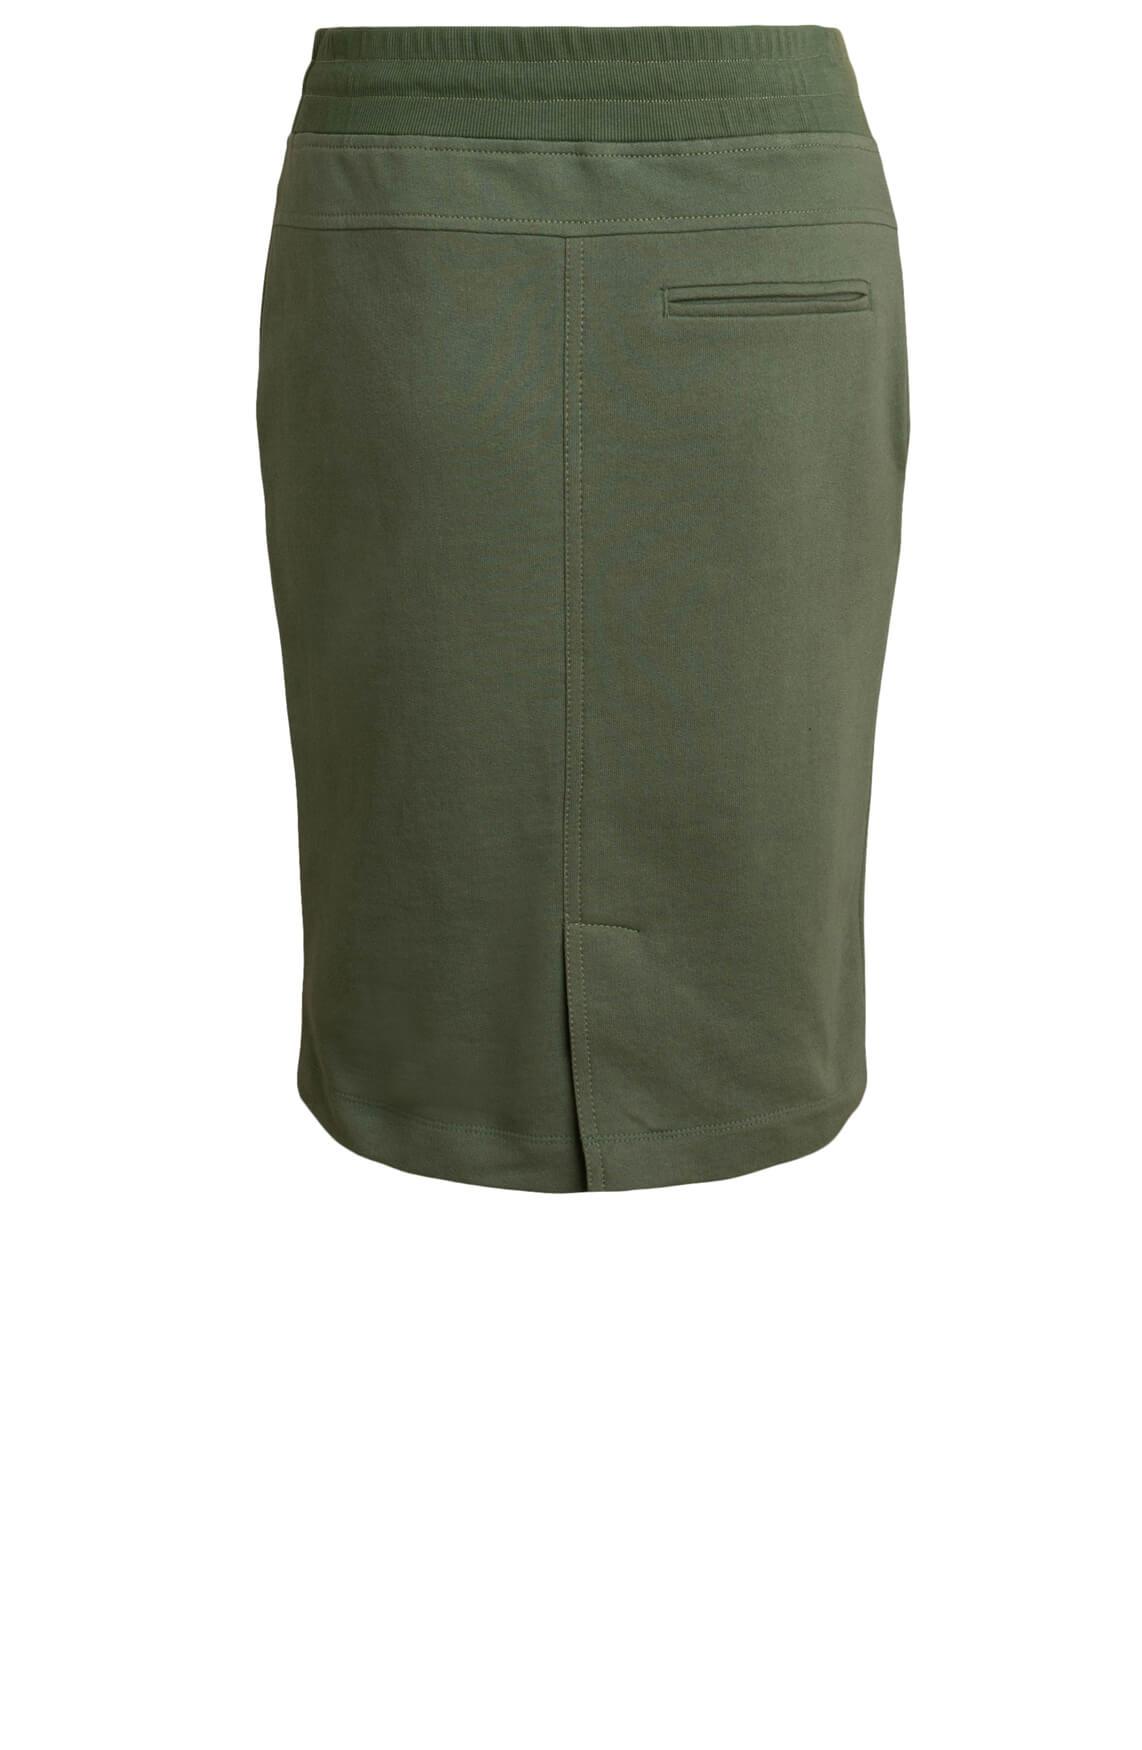 Moscow Dames Esmee sweat skirt Groen